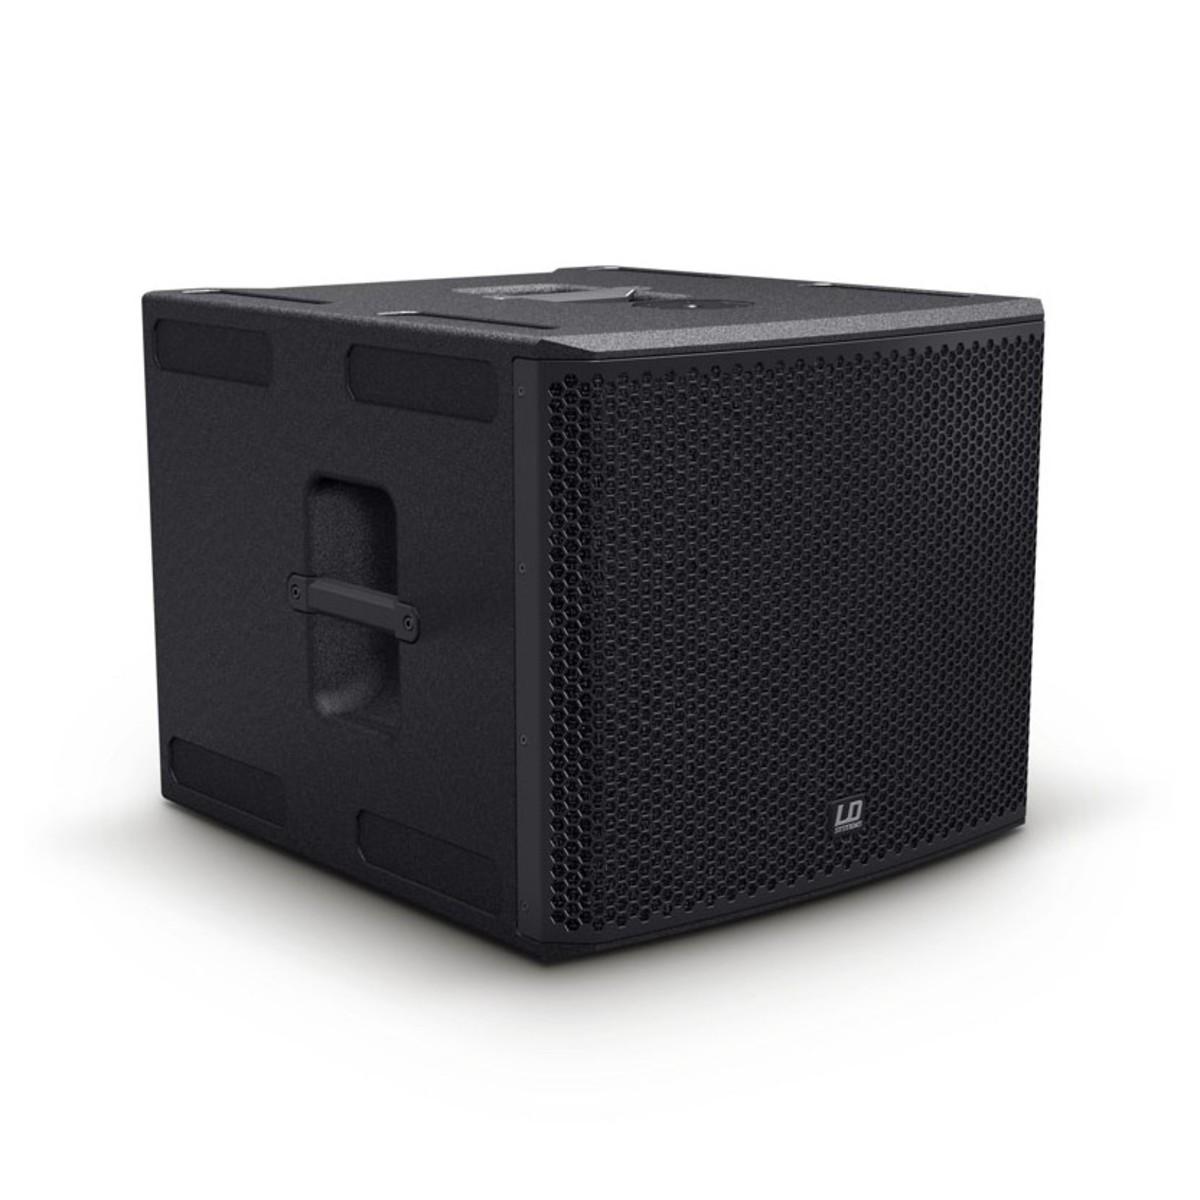 ld systems stinger g3 15 active pa subwoofer at gear4music. Black Bedroom Furniture Sets. Home Design Ideas